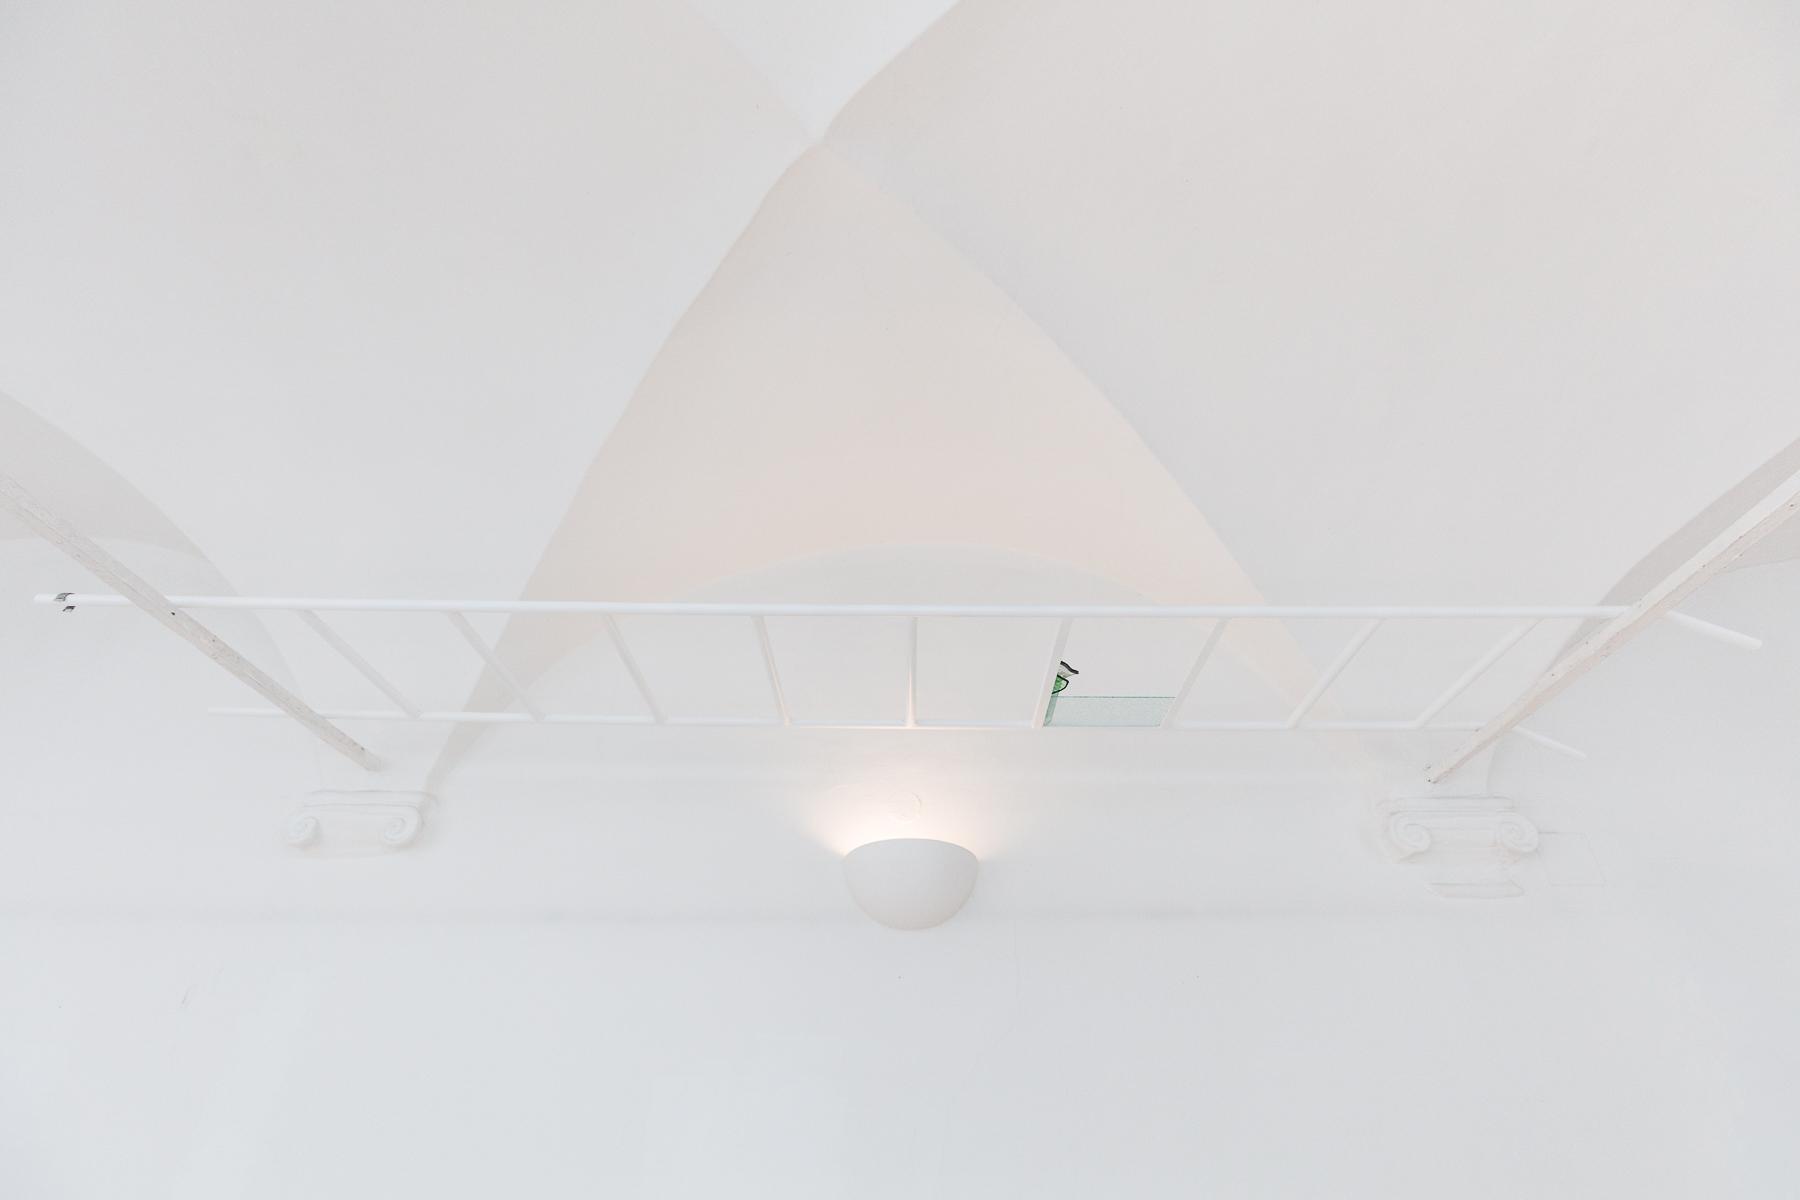 2019_05_05_Salwa-Aleryani_SORT_by-kunst-dokumentation-com_007_web.jpg